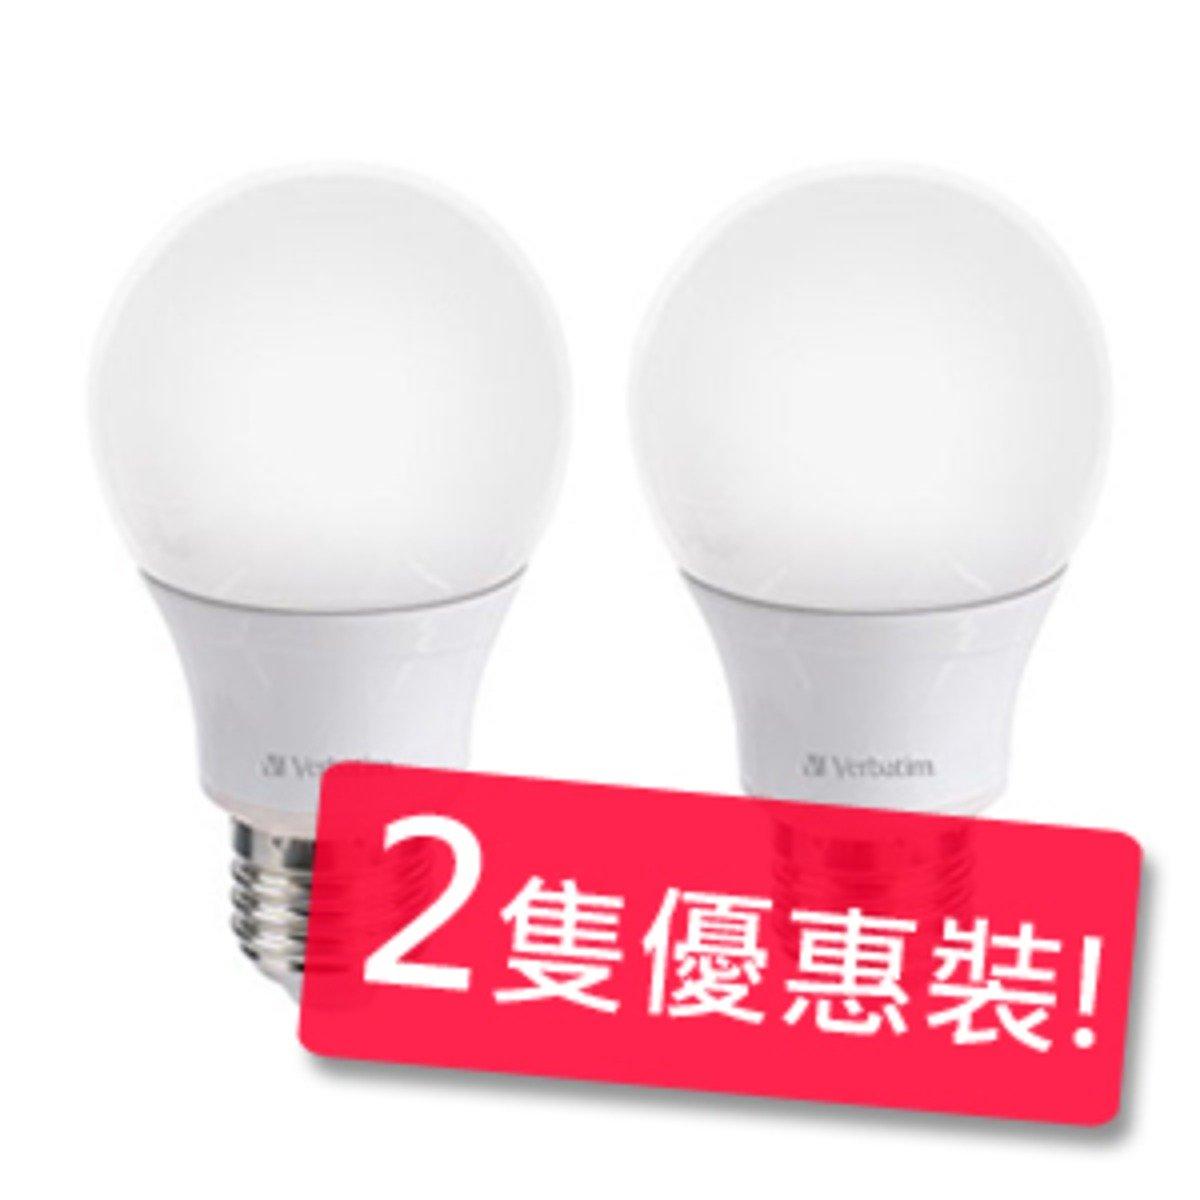 Verbatim 6瓦 E27 530lm 6000k 燈泡 (冷白) 2隻優惠裝